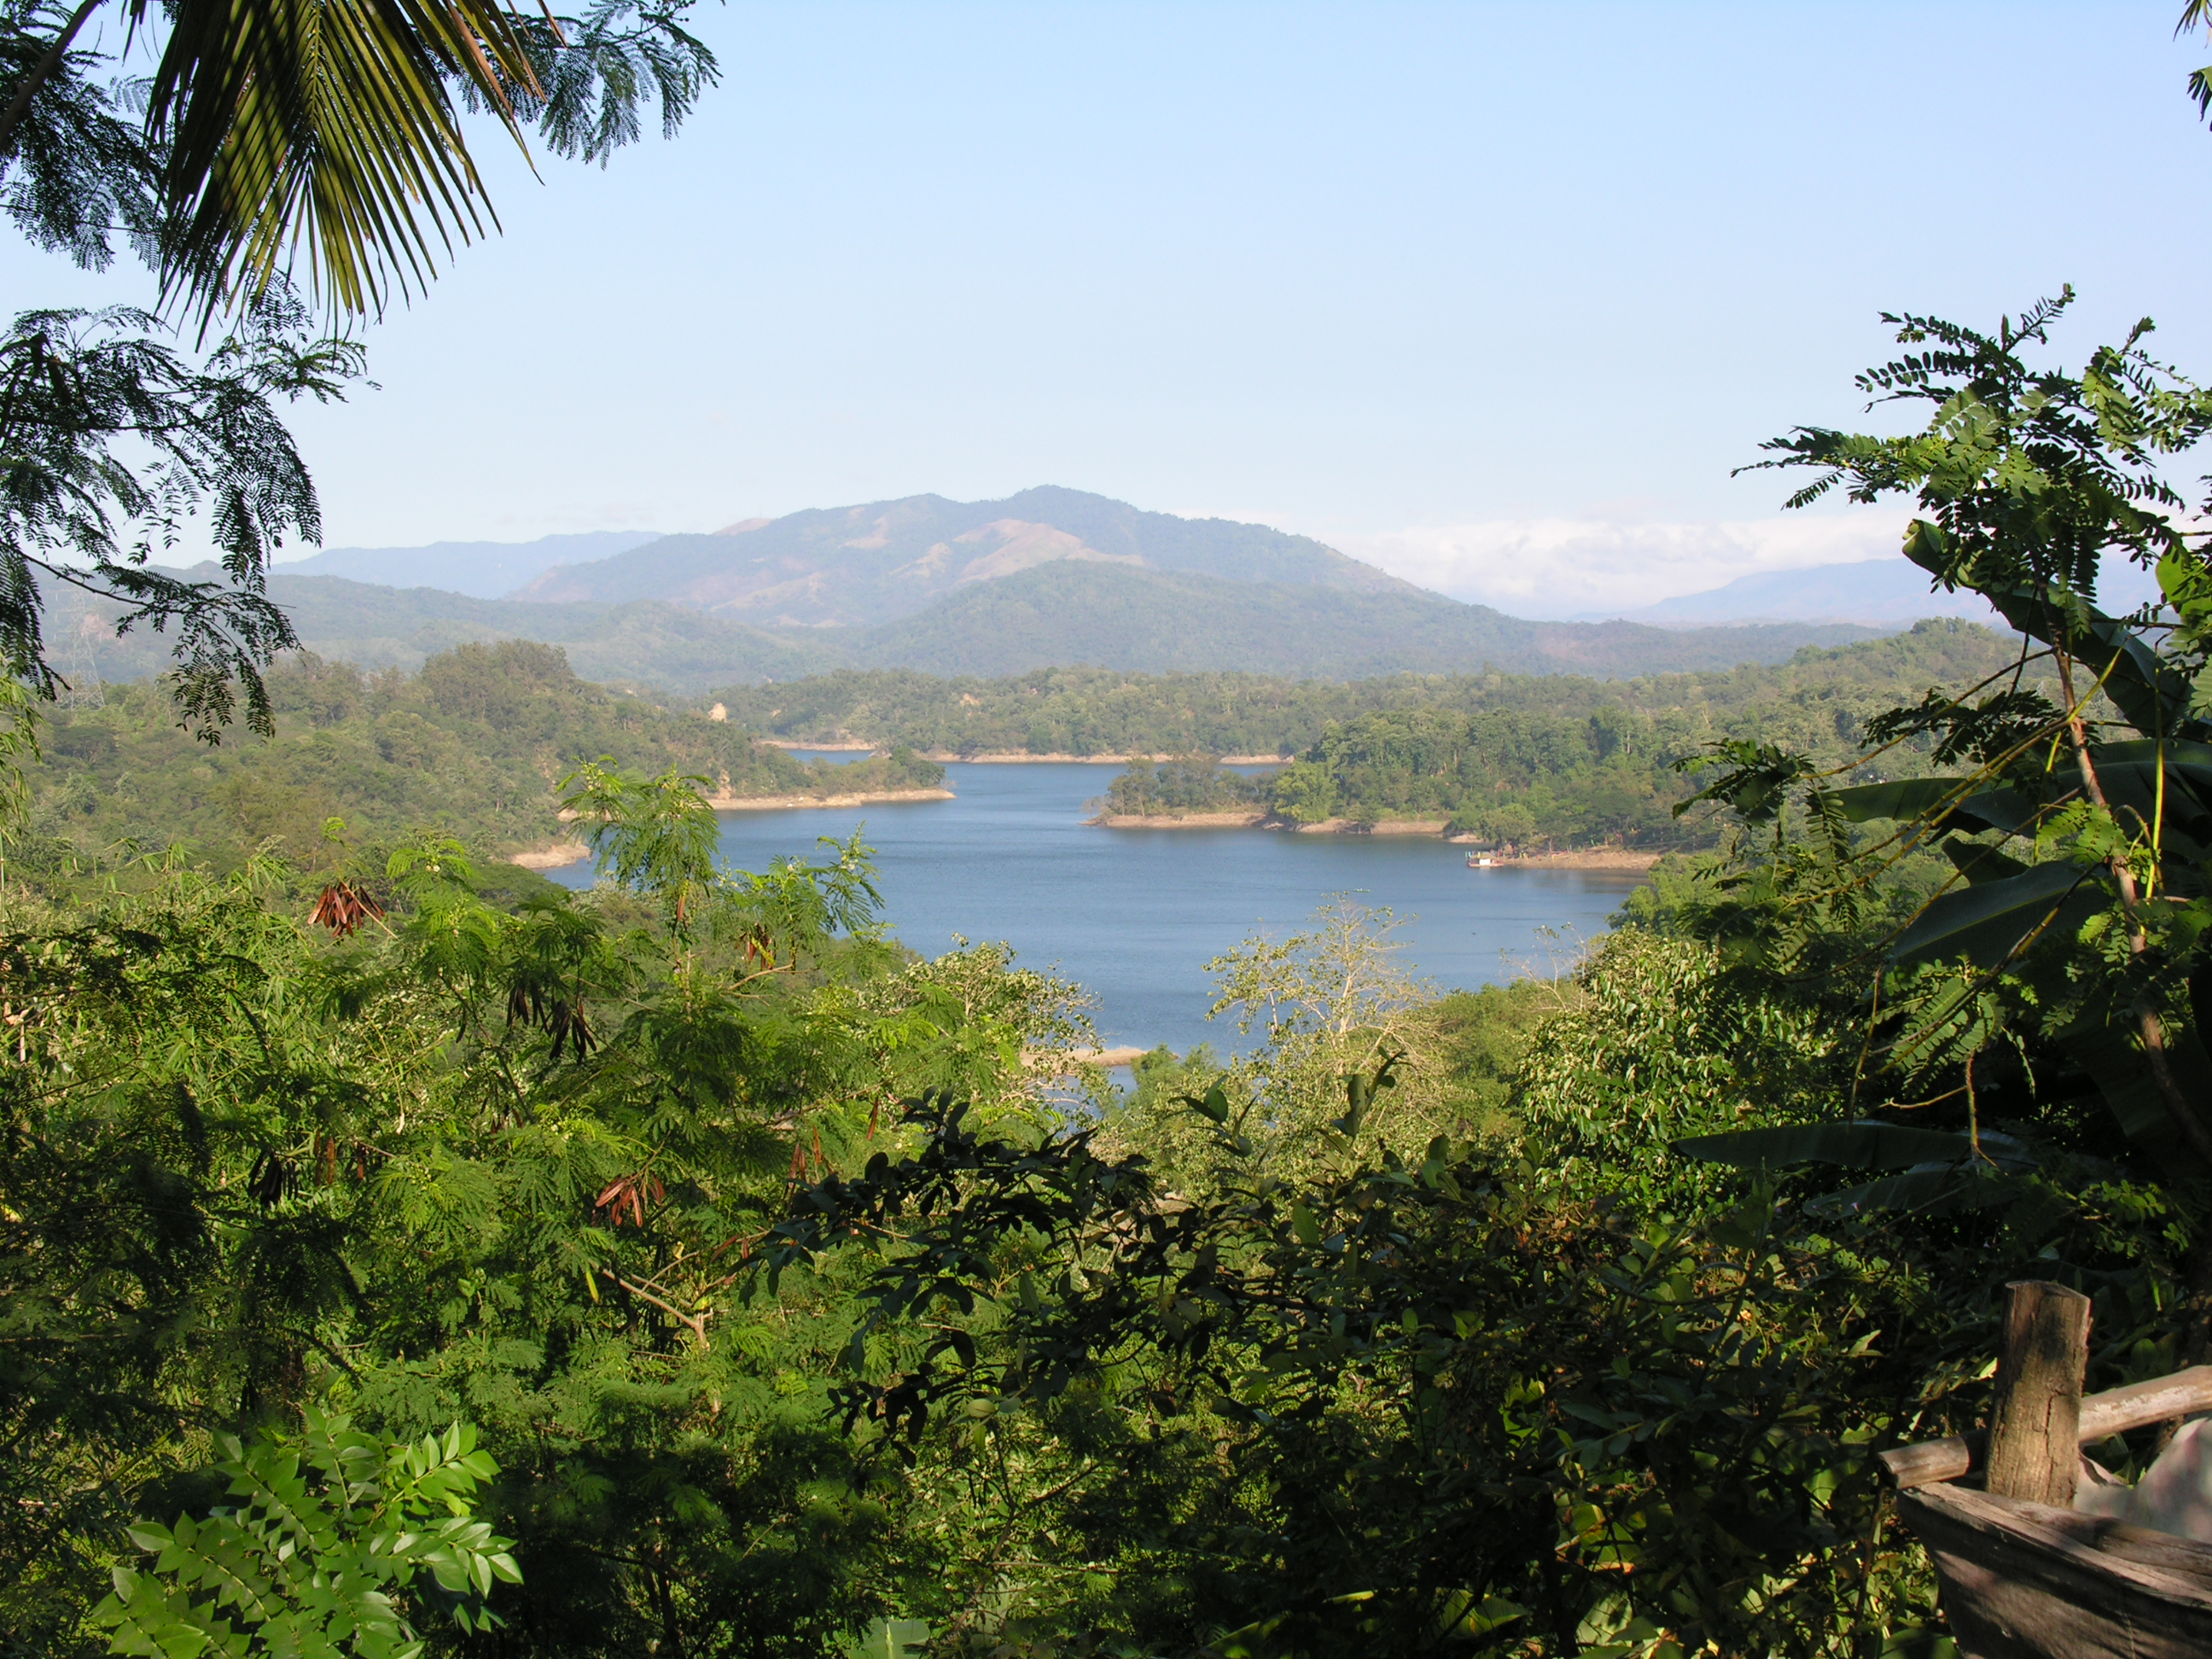 Pantabangan-Carranglan Watershed